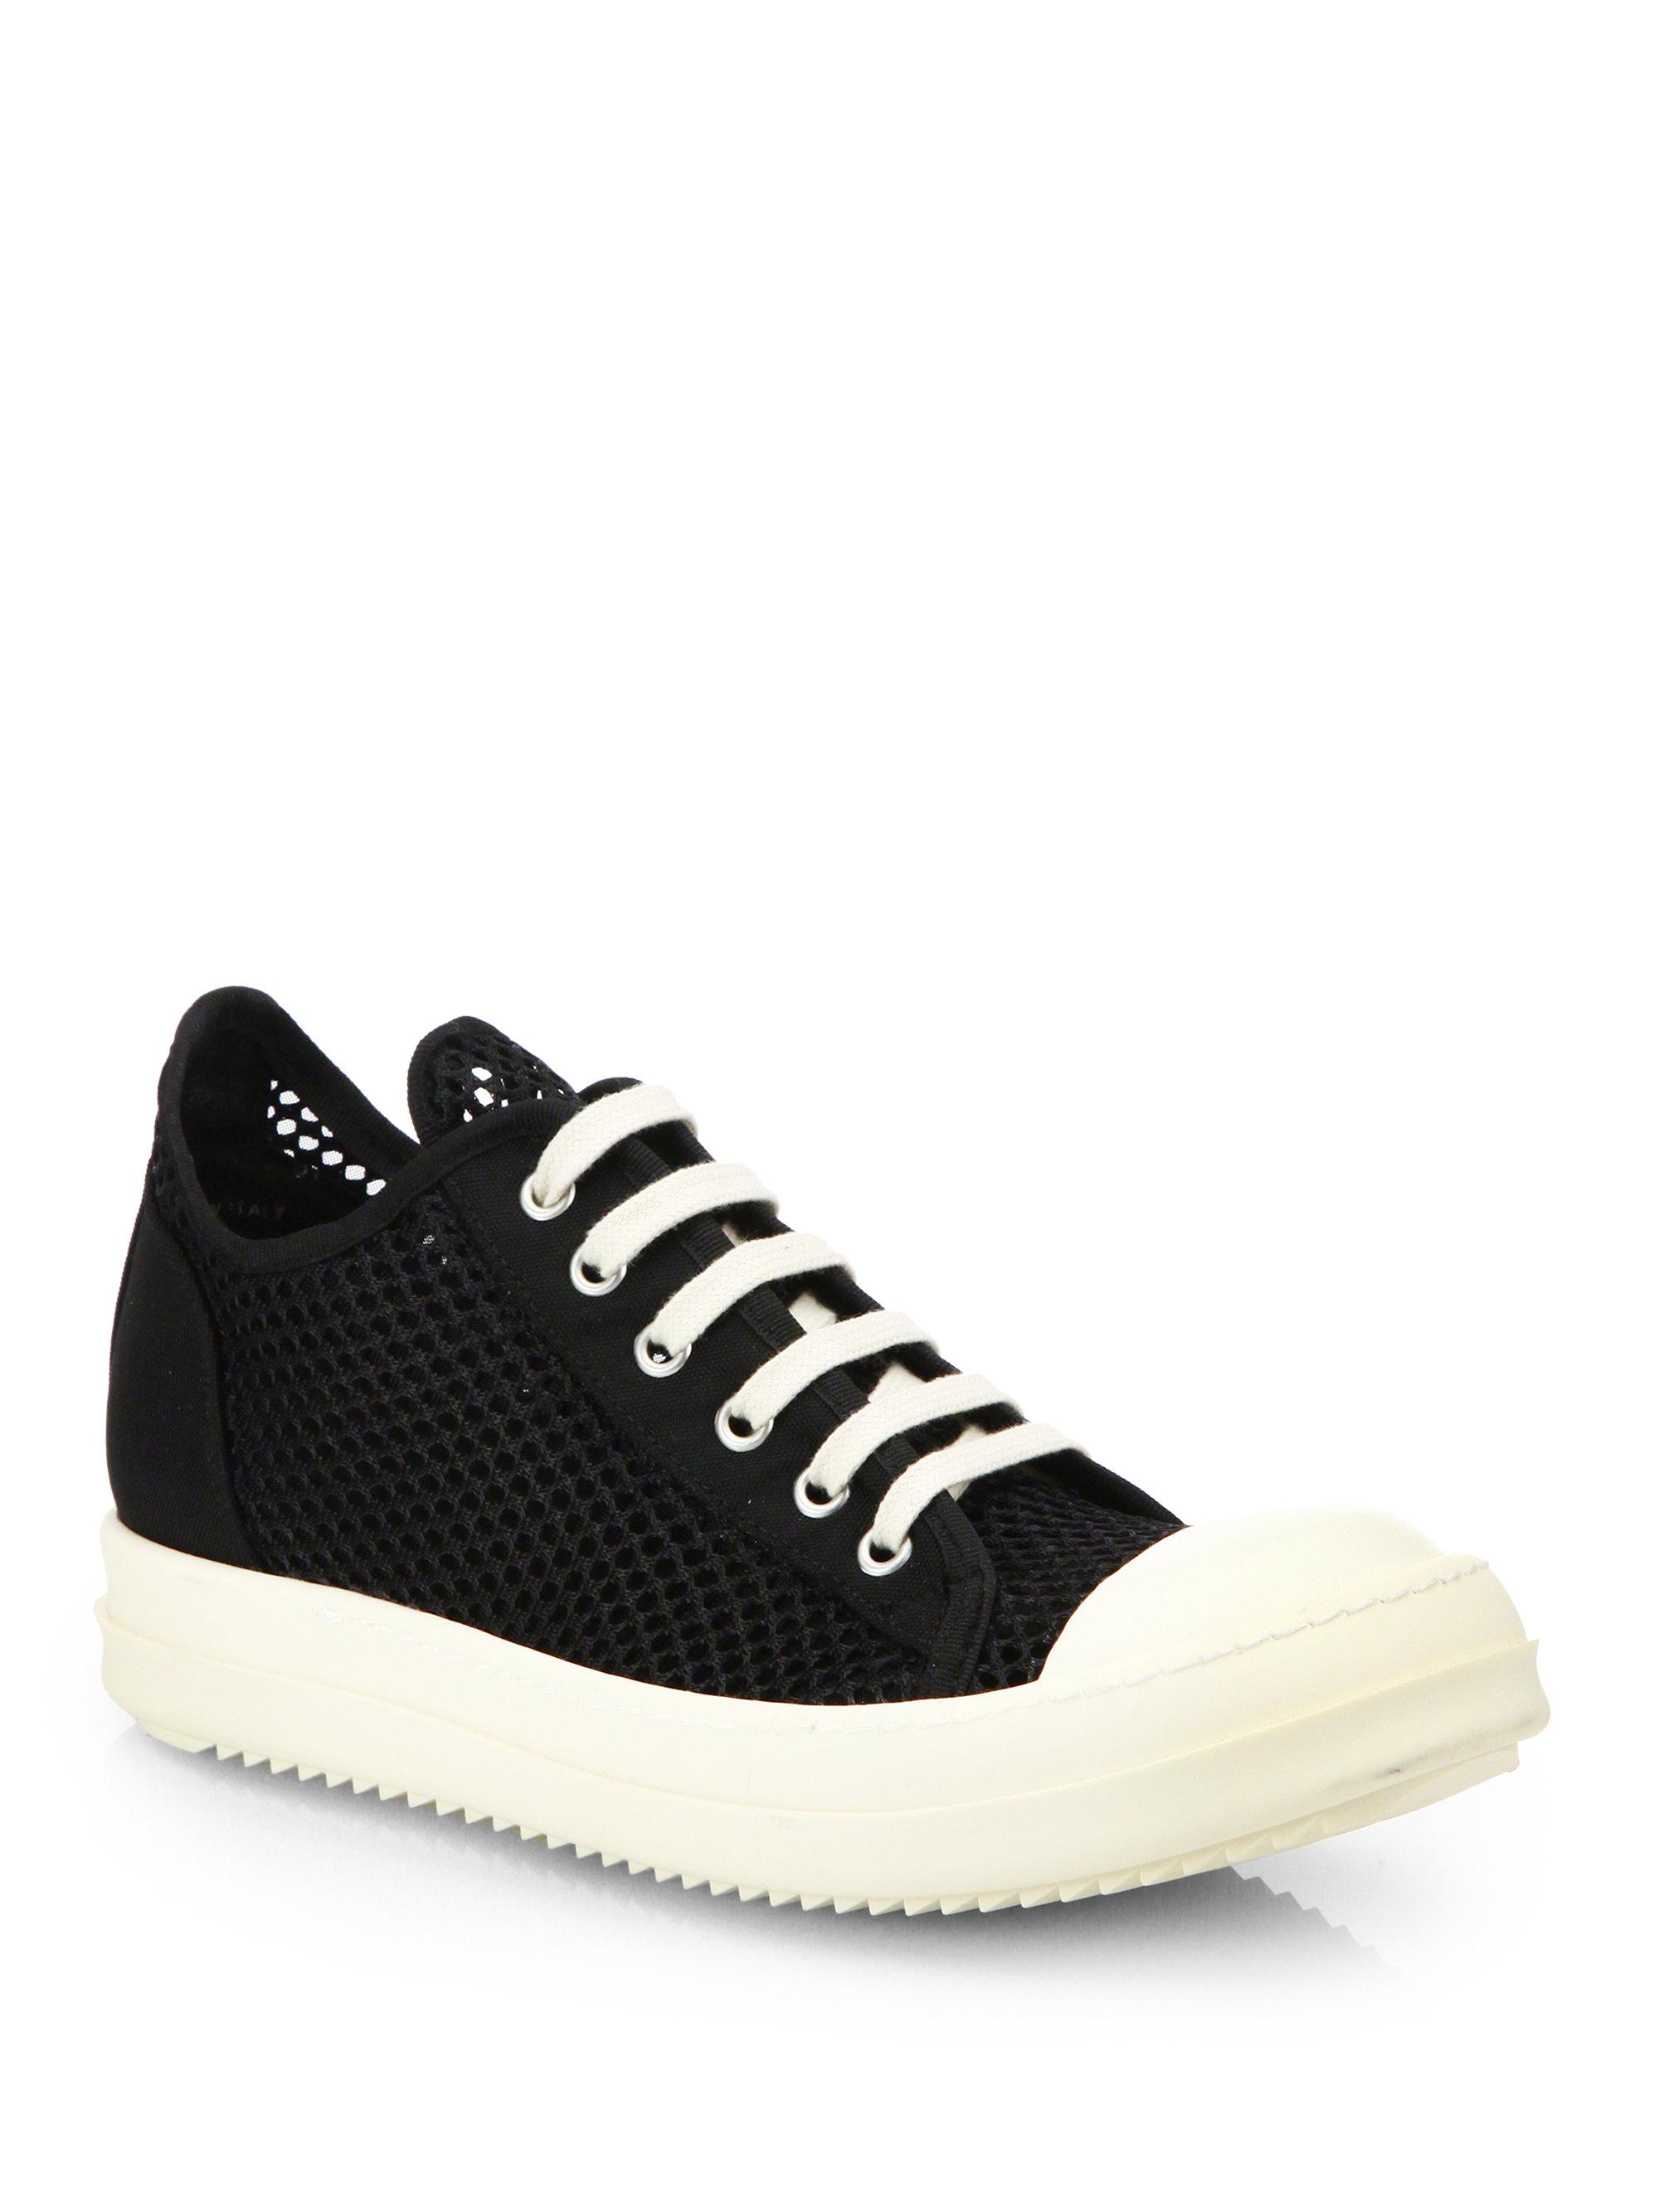 Adidas Rick Owens Saks Shoes